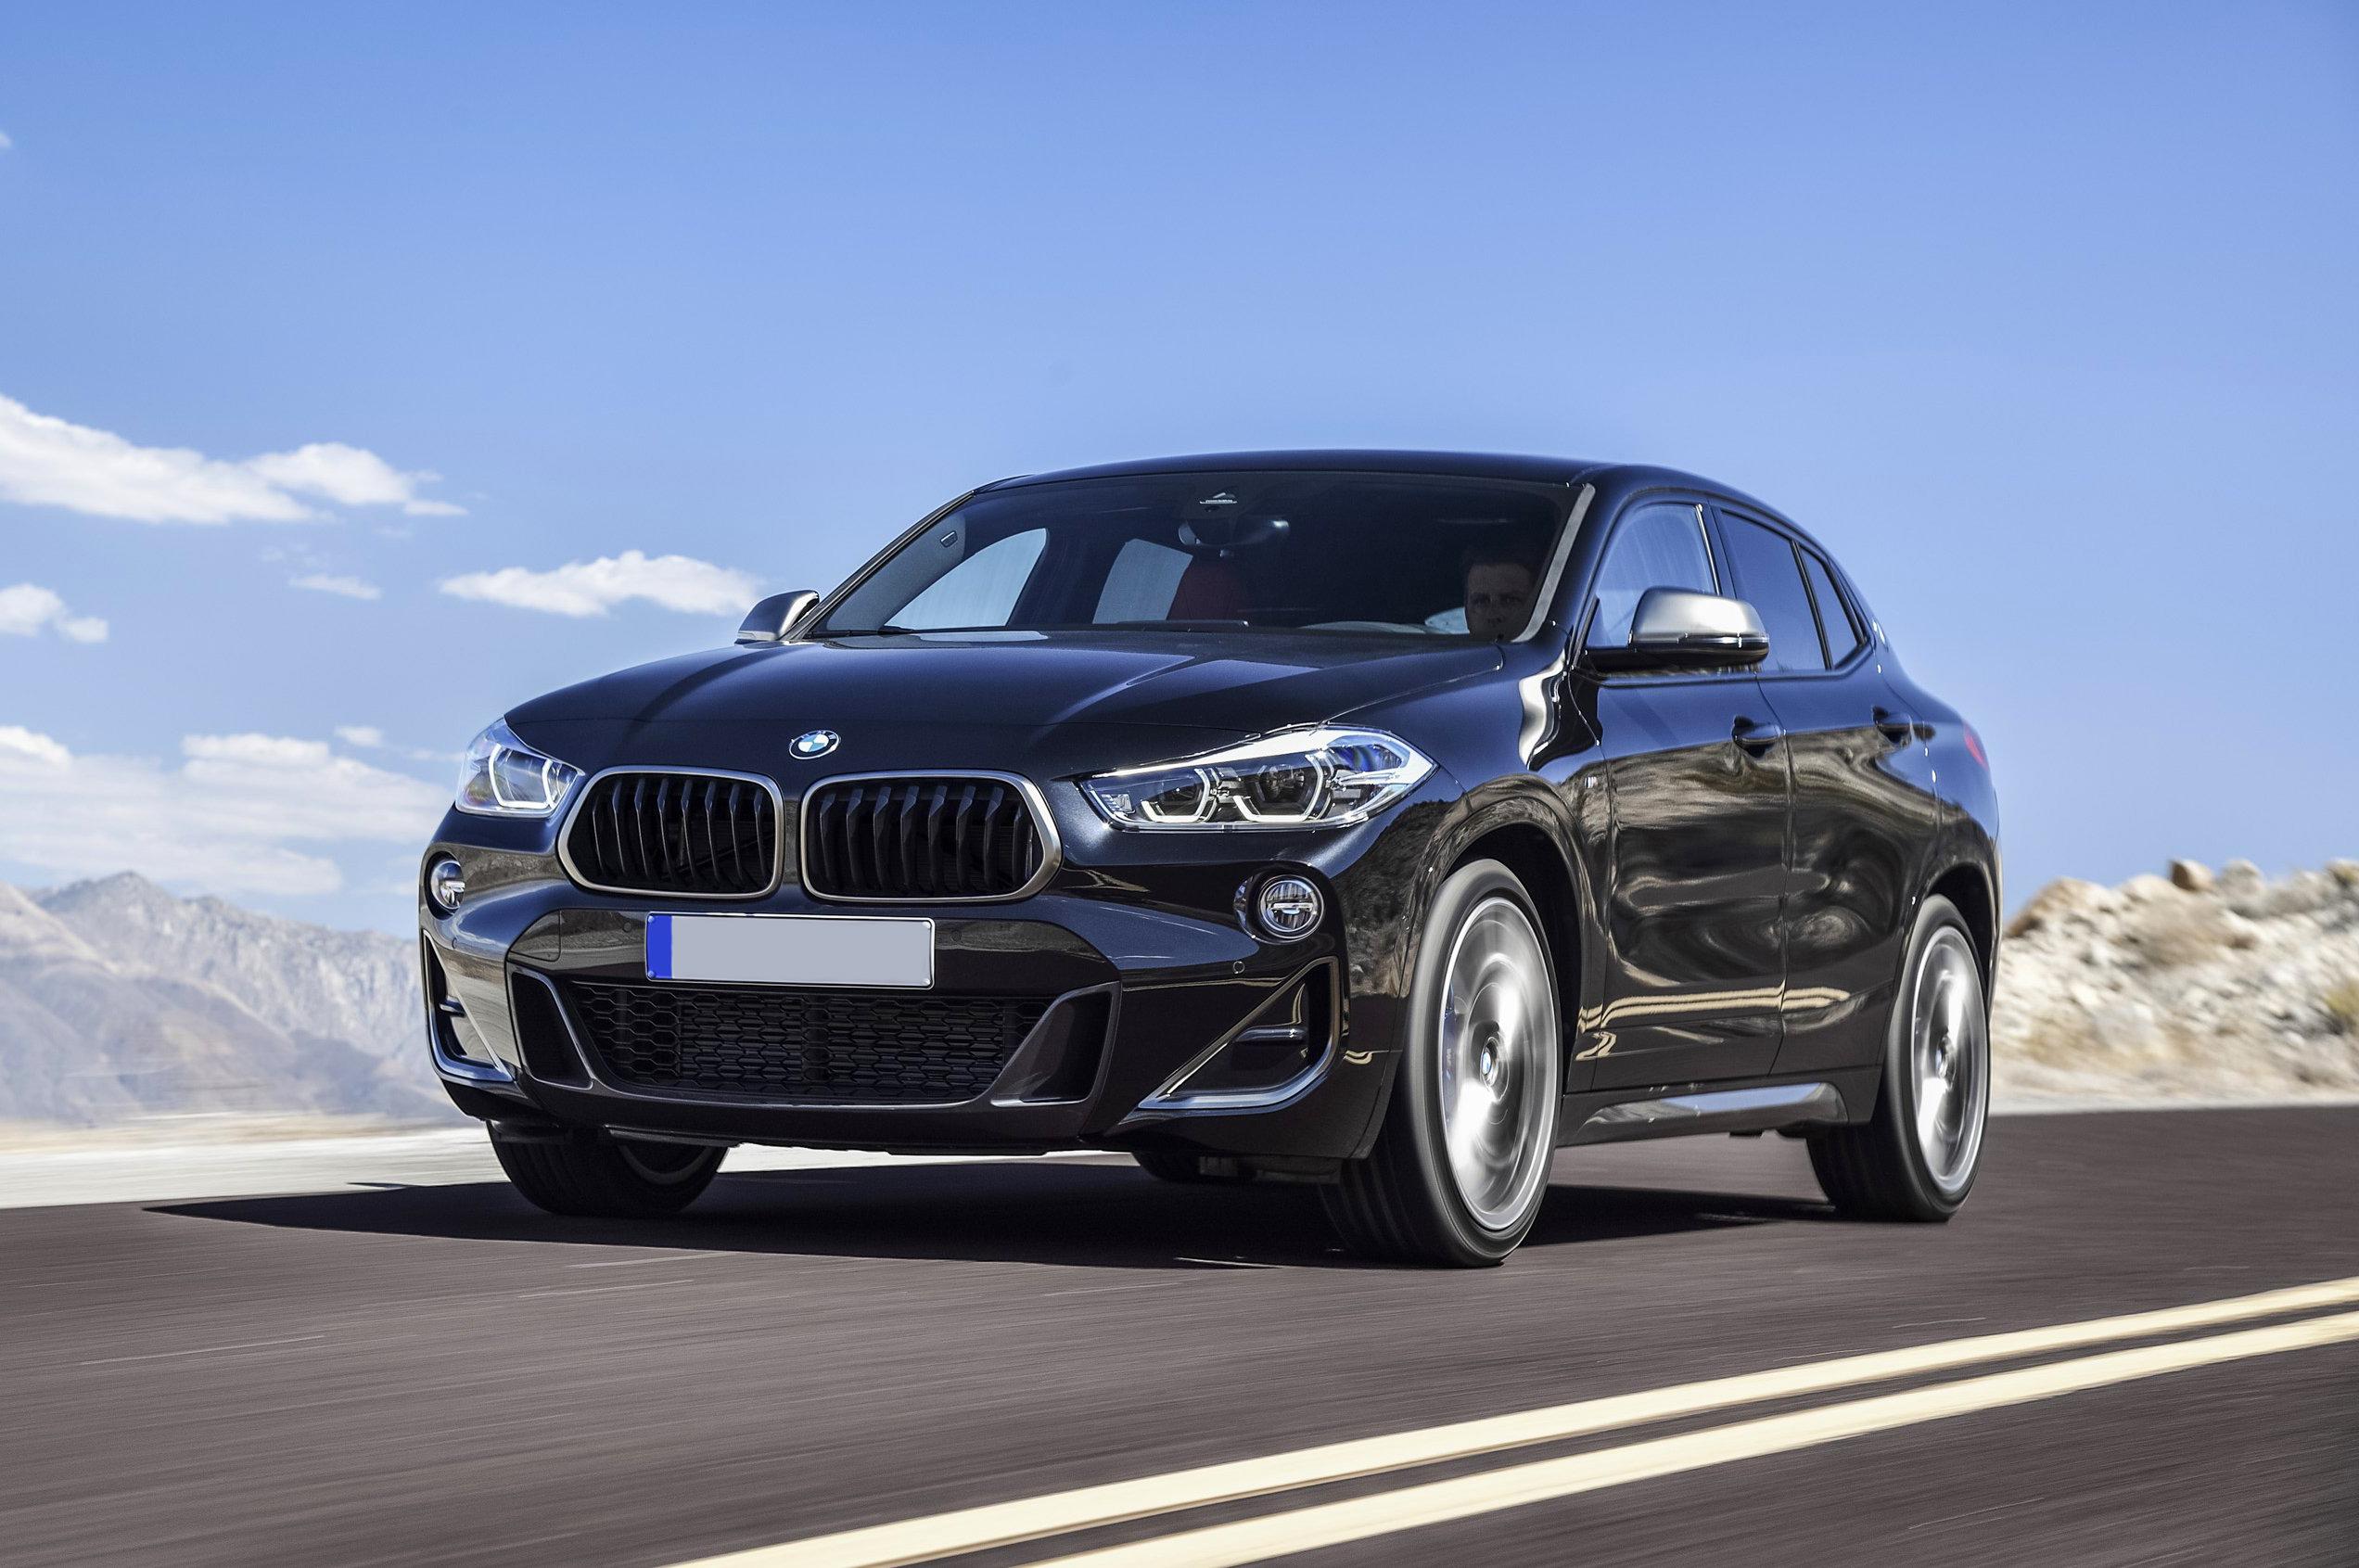 BMW X2 M35i Image1.jpg (959 KB)